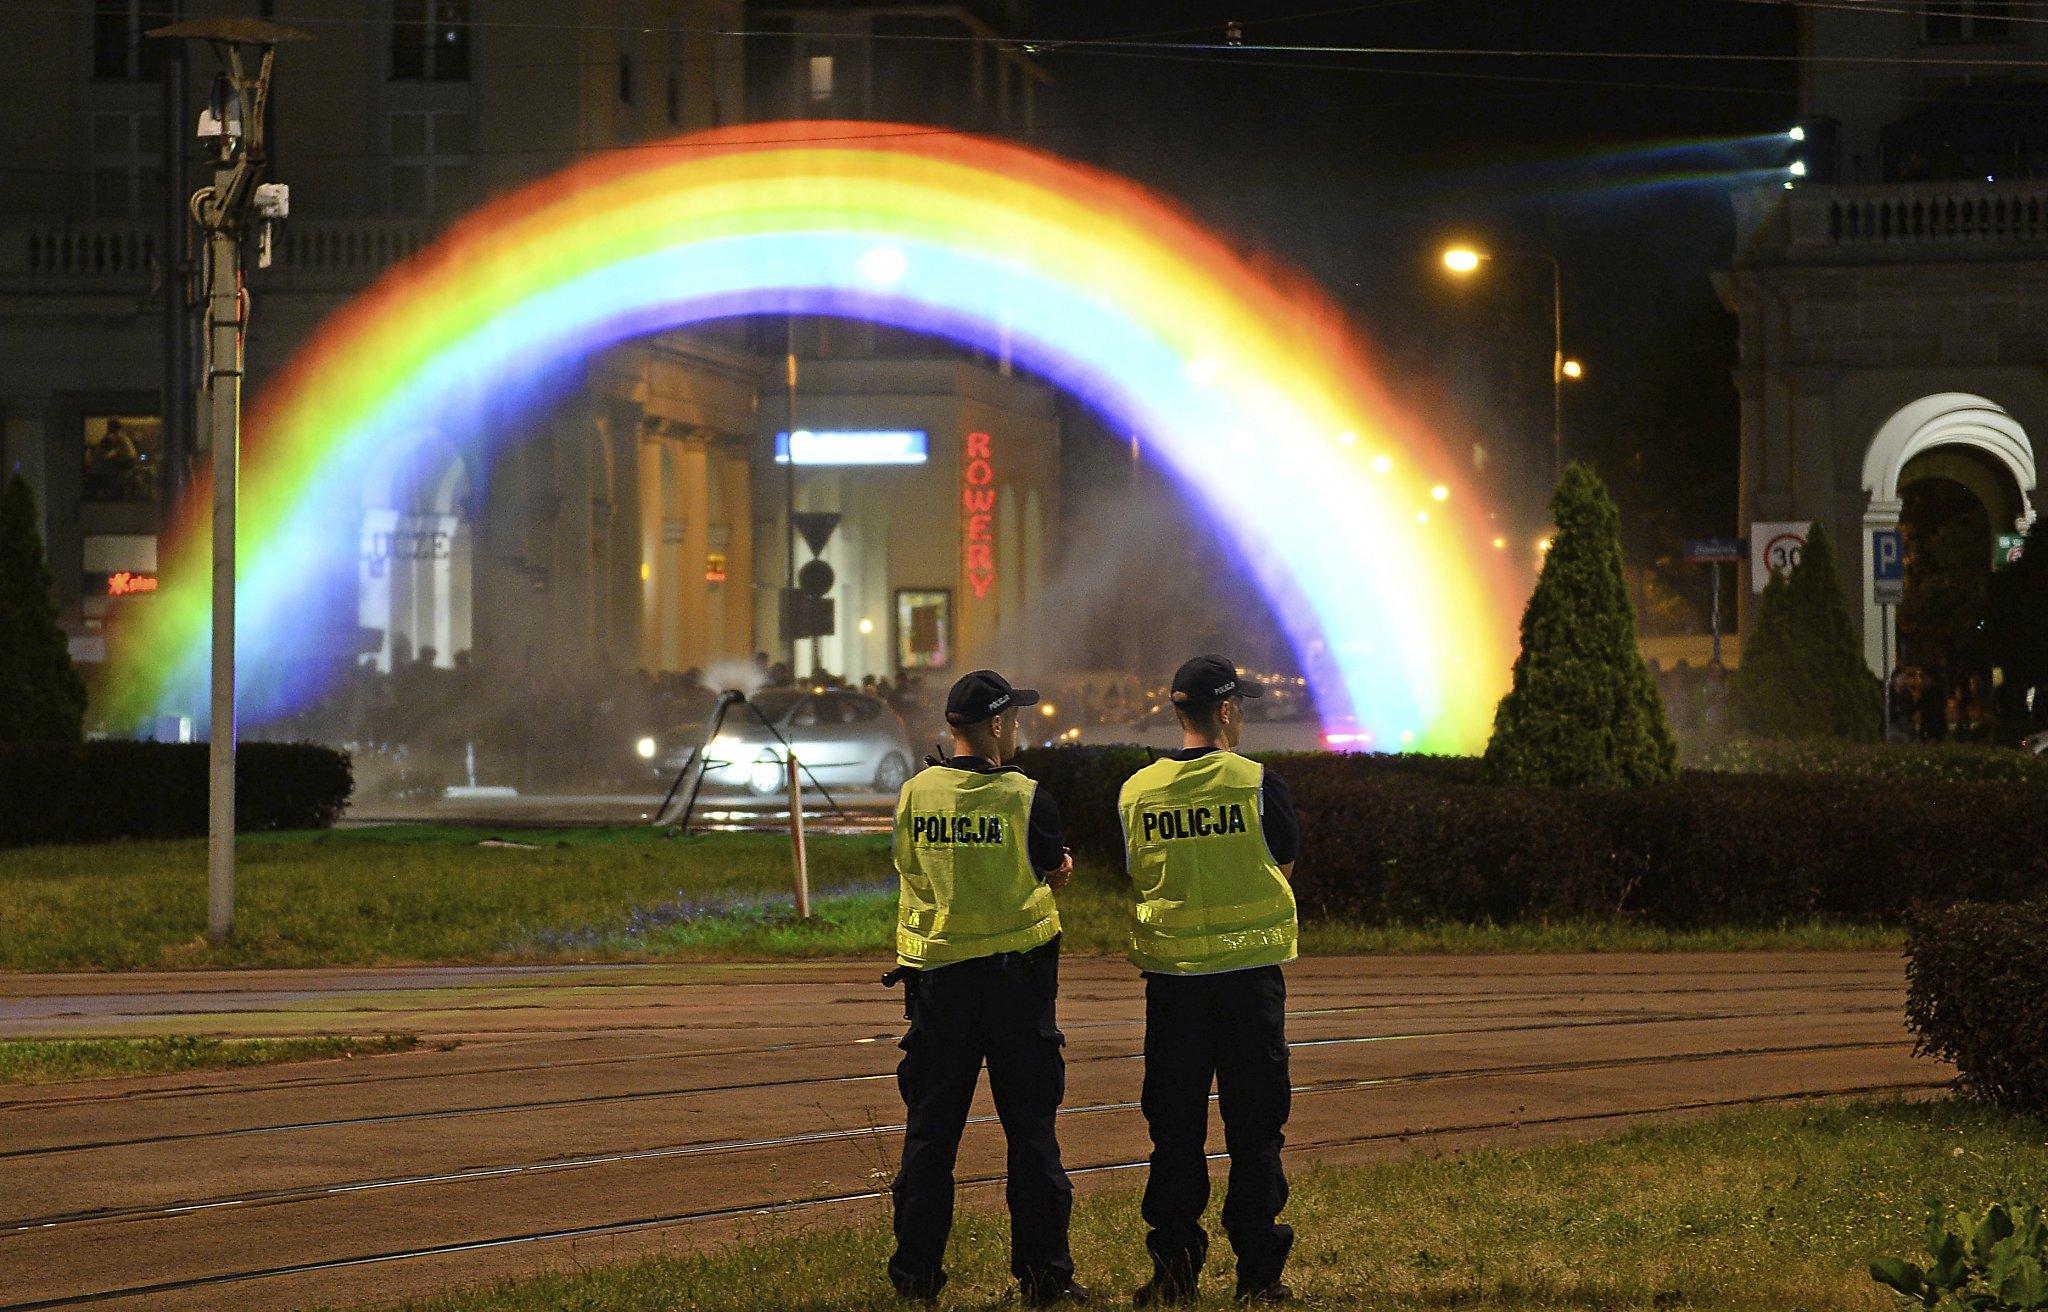 Artist who created rainbow flag, gay pride symbol, dies